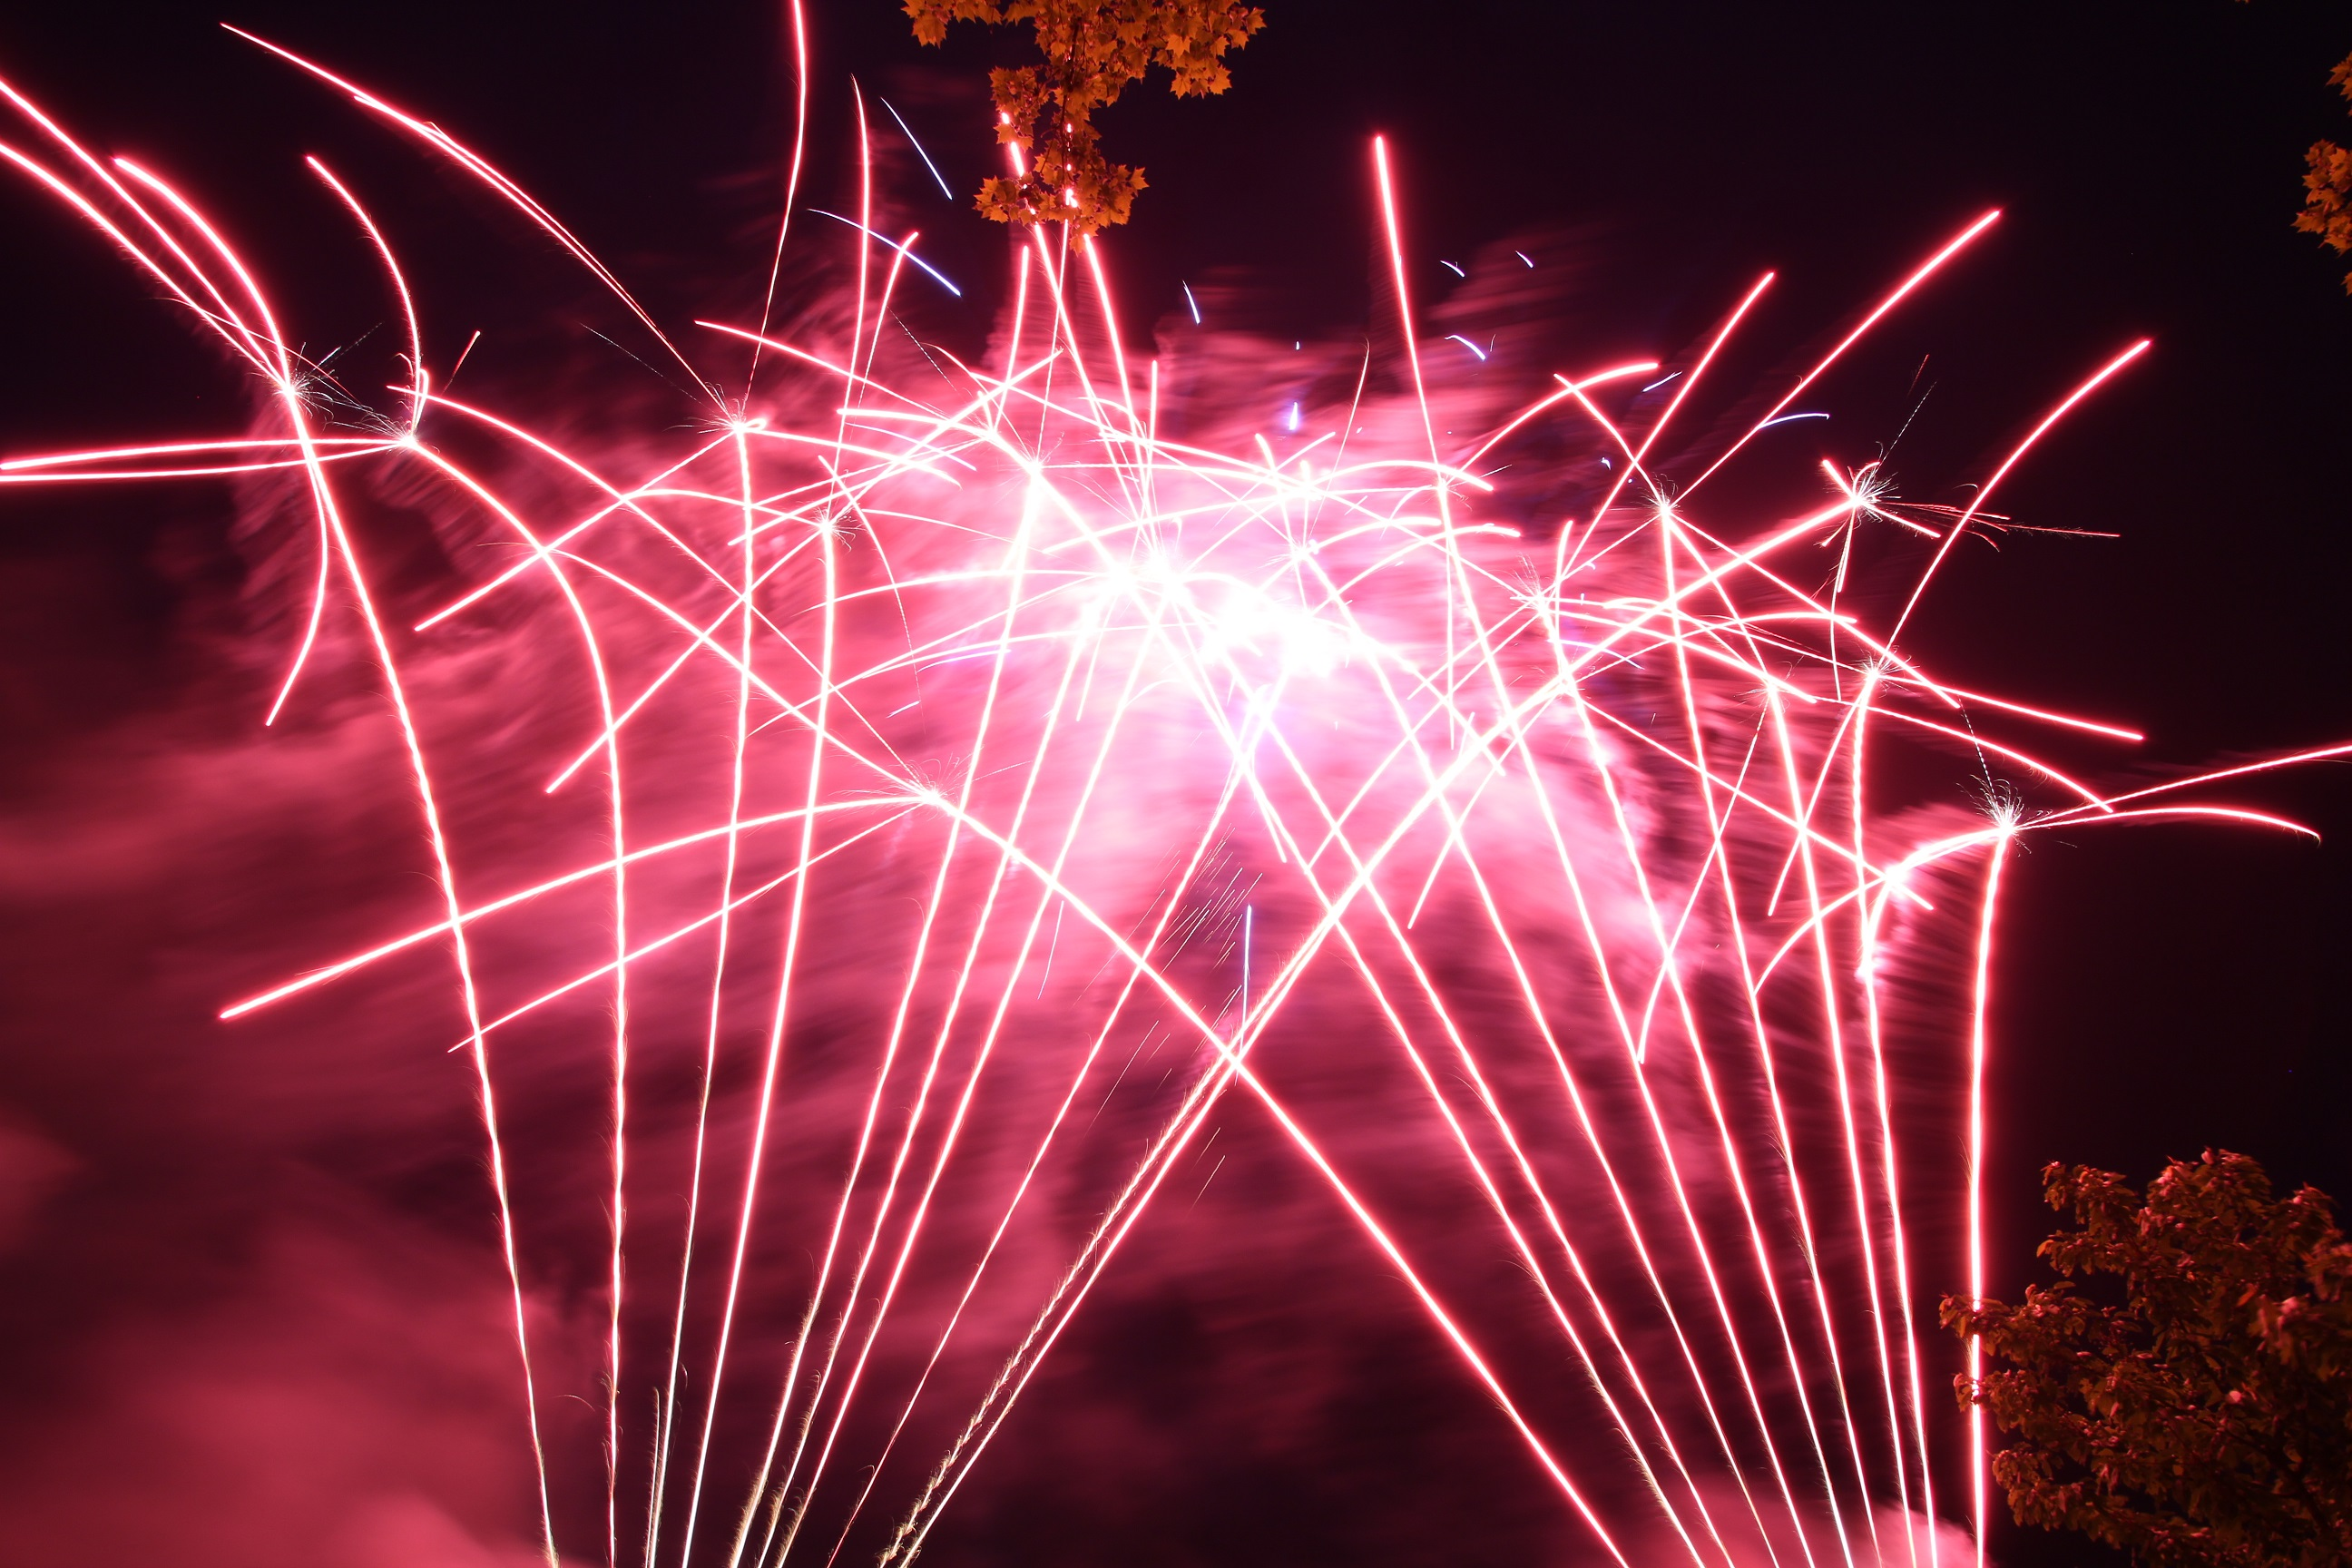 Feuerbändiger Feuerwerke